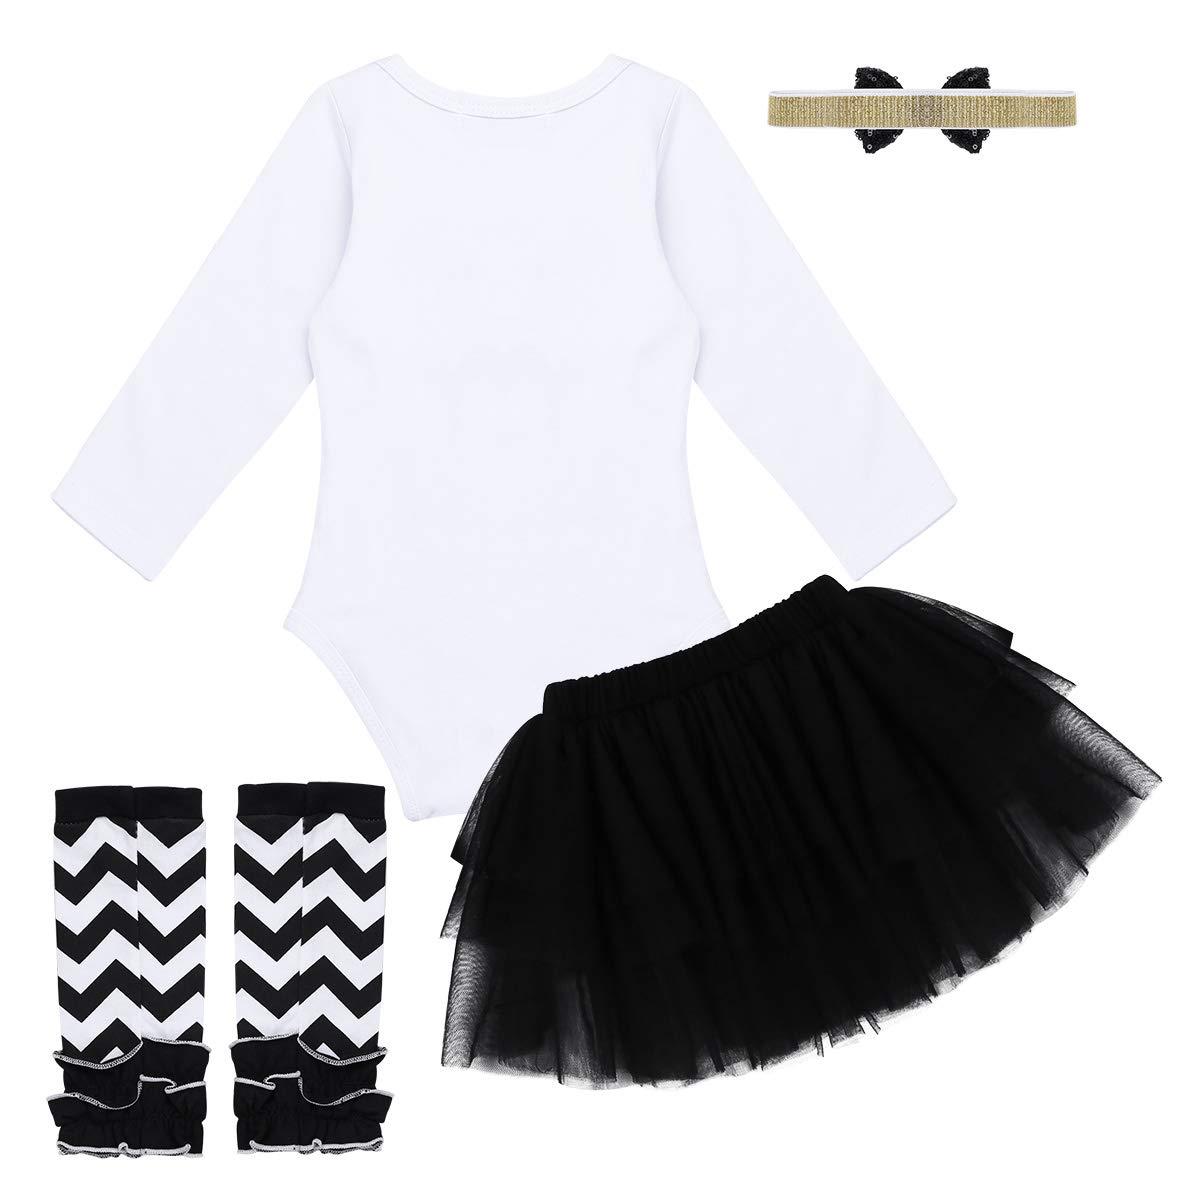 FEESHOW Baby Girls My 1st Halloween Outfit Costumes Romper Bodysuit Tutu Skirt Headband Set Black 5 pcs Set 0-3 Months by FEESHOW (Image #2)